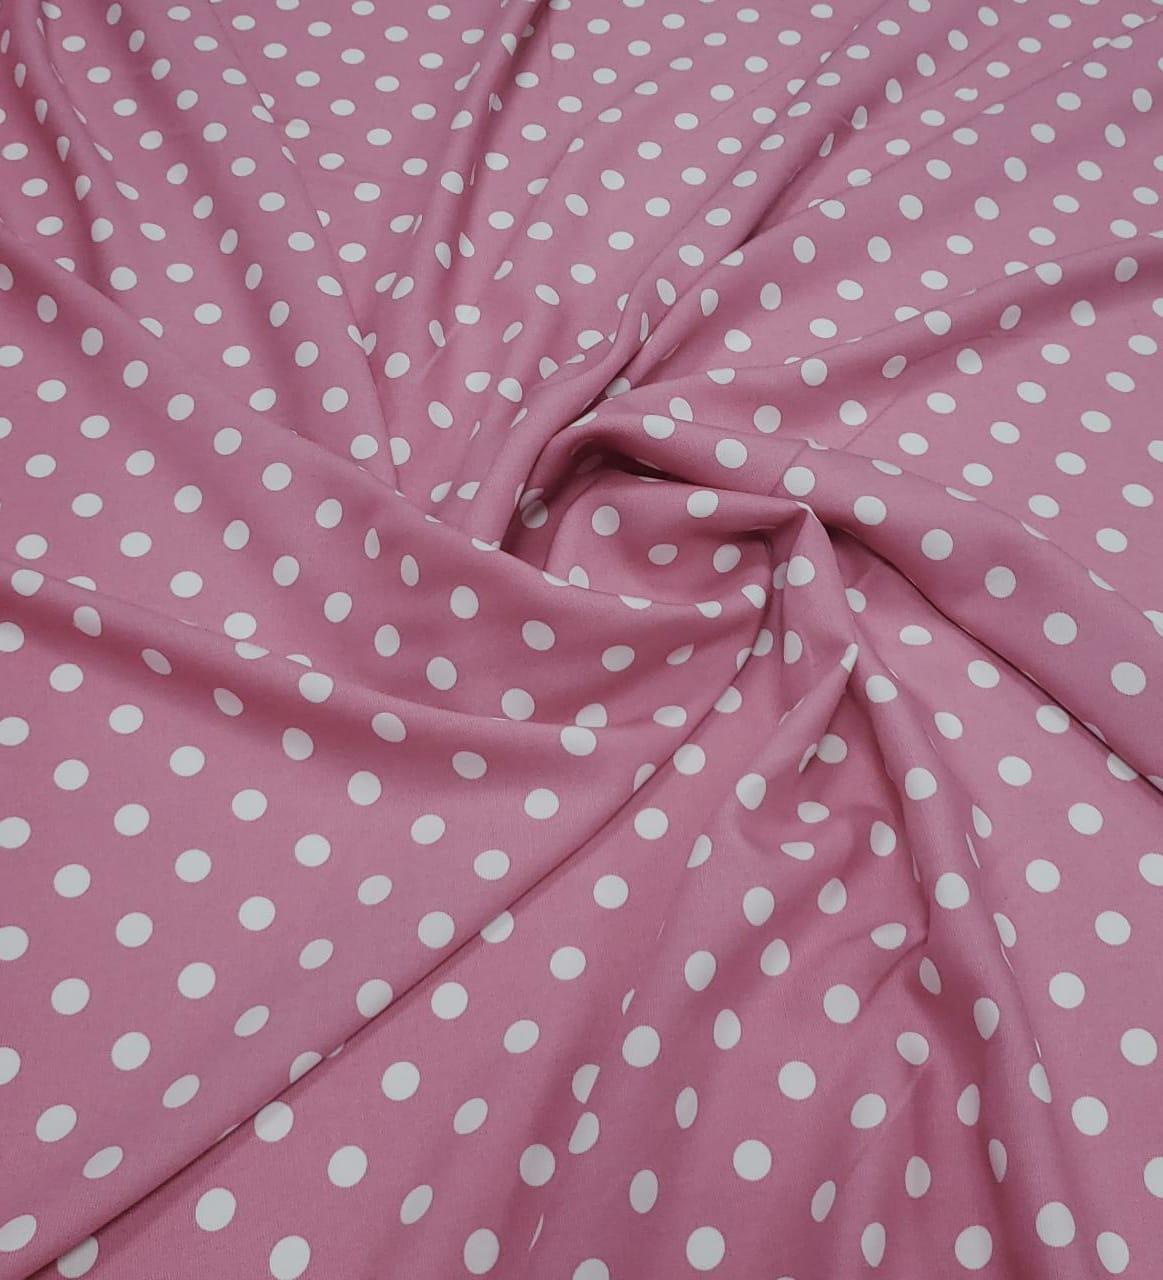 Popeline de Viscose Premium Fundo Rosa Poá Bola Pequena Branco